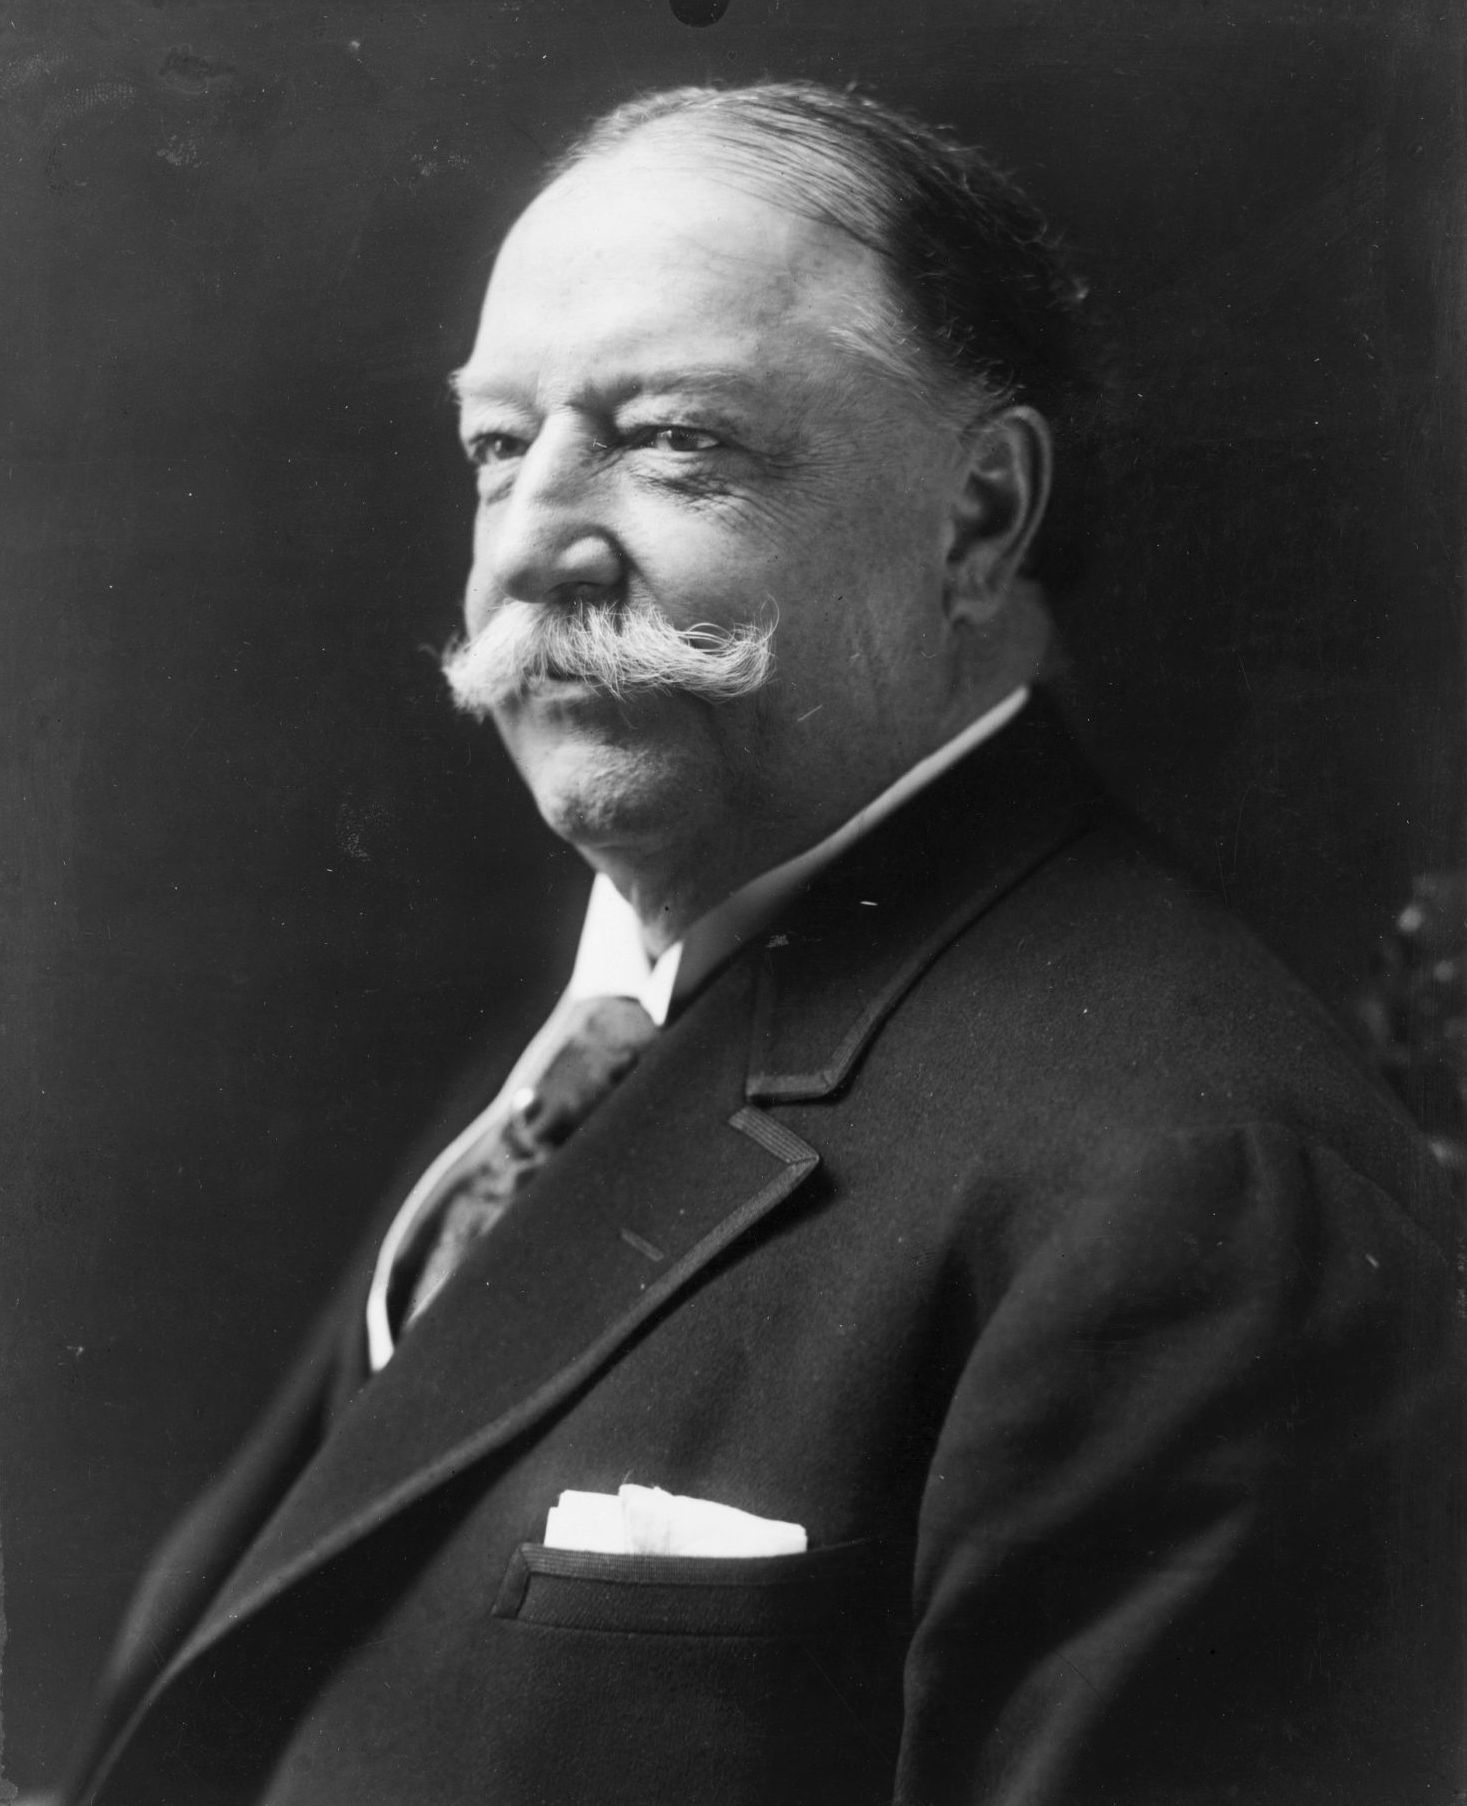 Descrizione William Howard Taft I jpgWilliam Taft